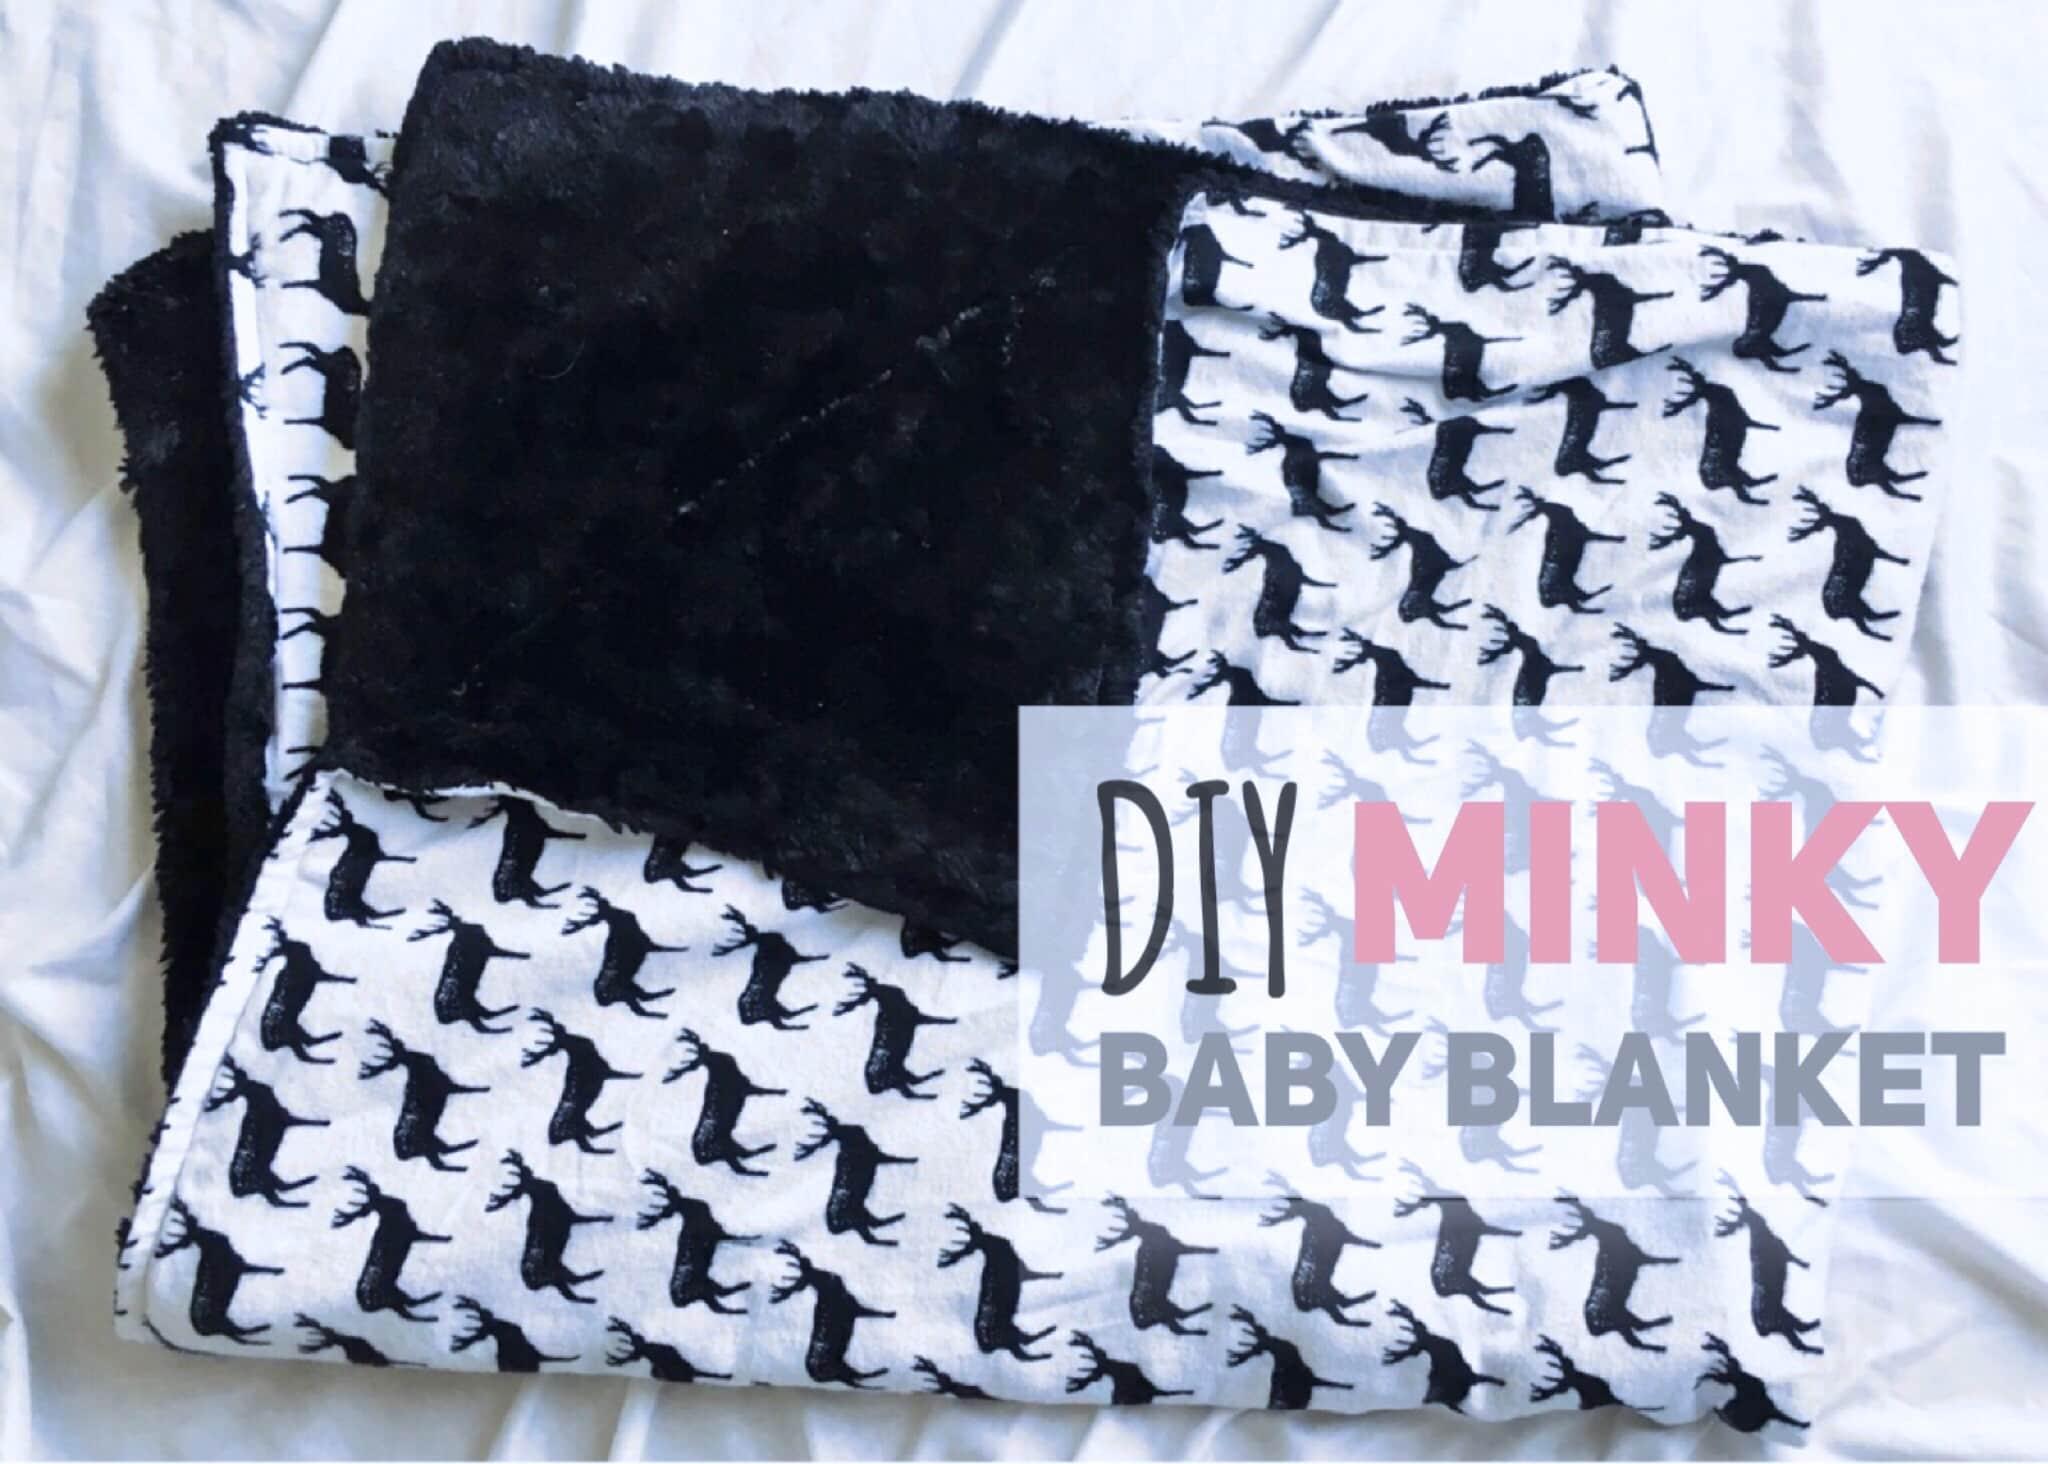 diy-minky-baby-blanket-life-on-waller